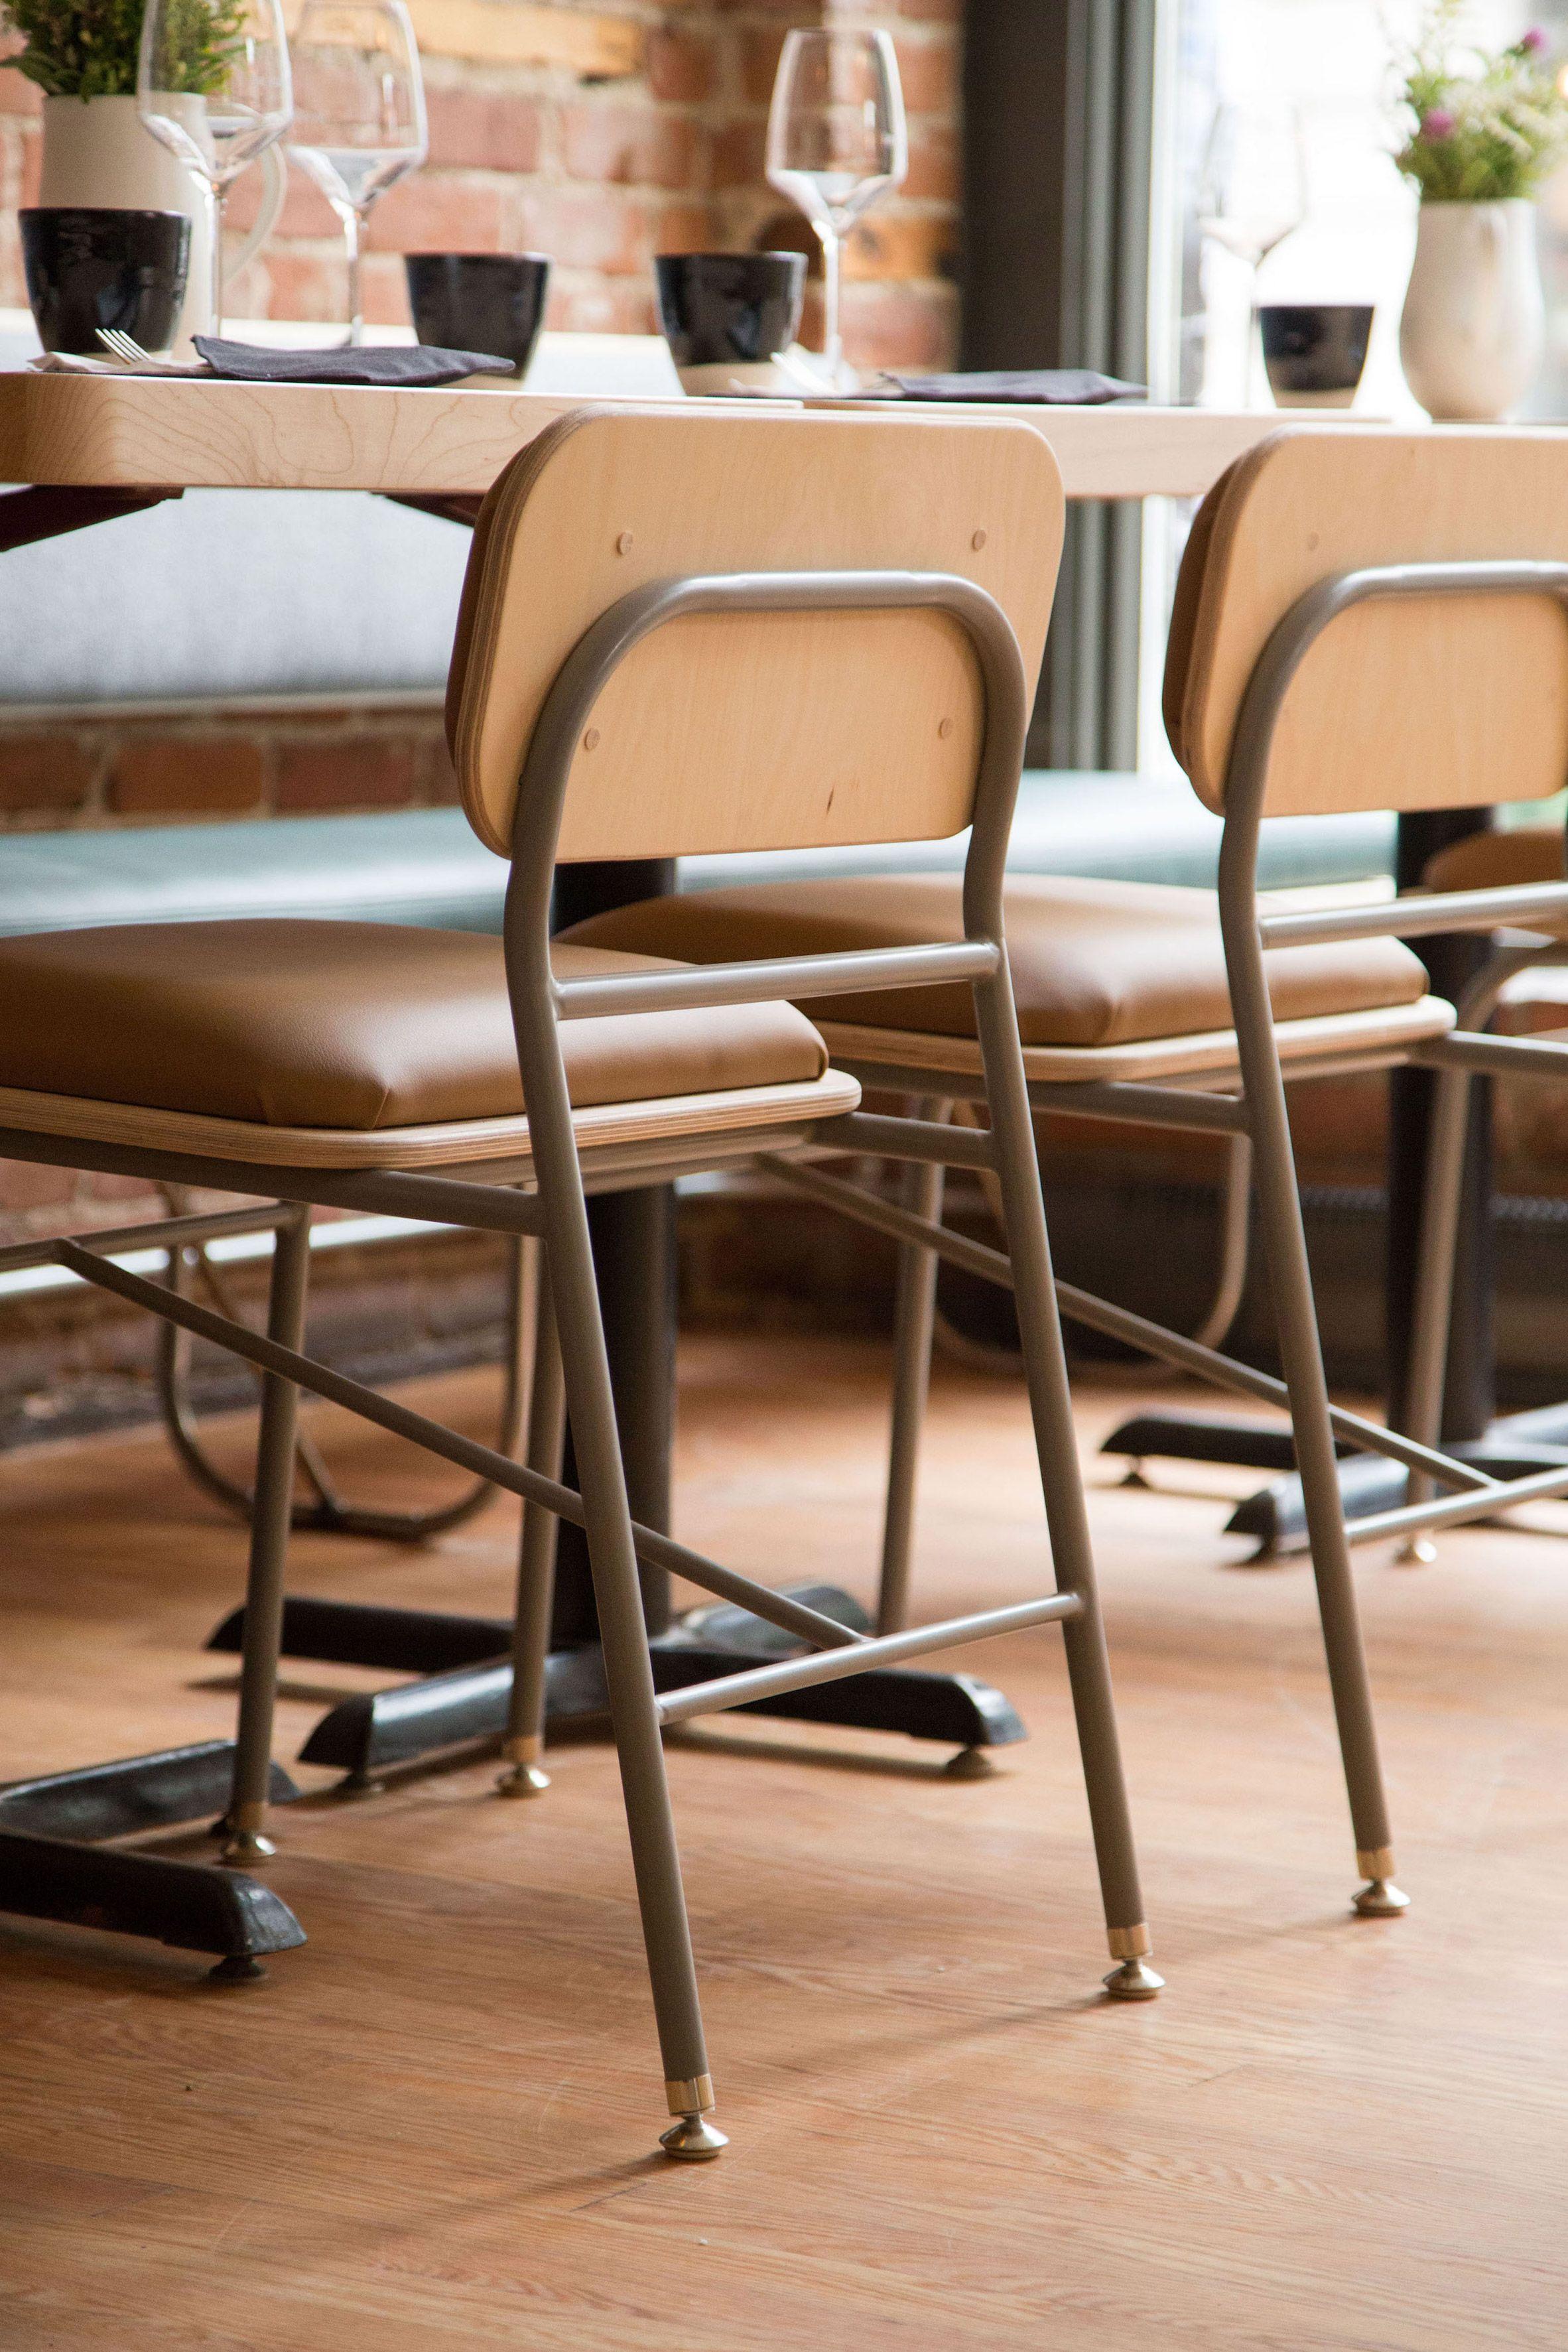 Atelier Filz Designs Bespoke Lighting And Chairs For Restaurant In Quebec City Sillas Restaurantes Bar